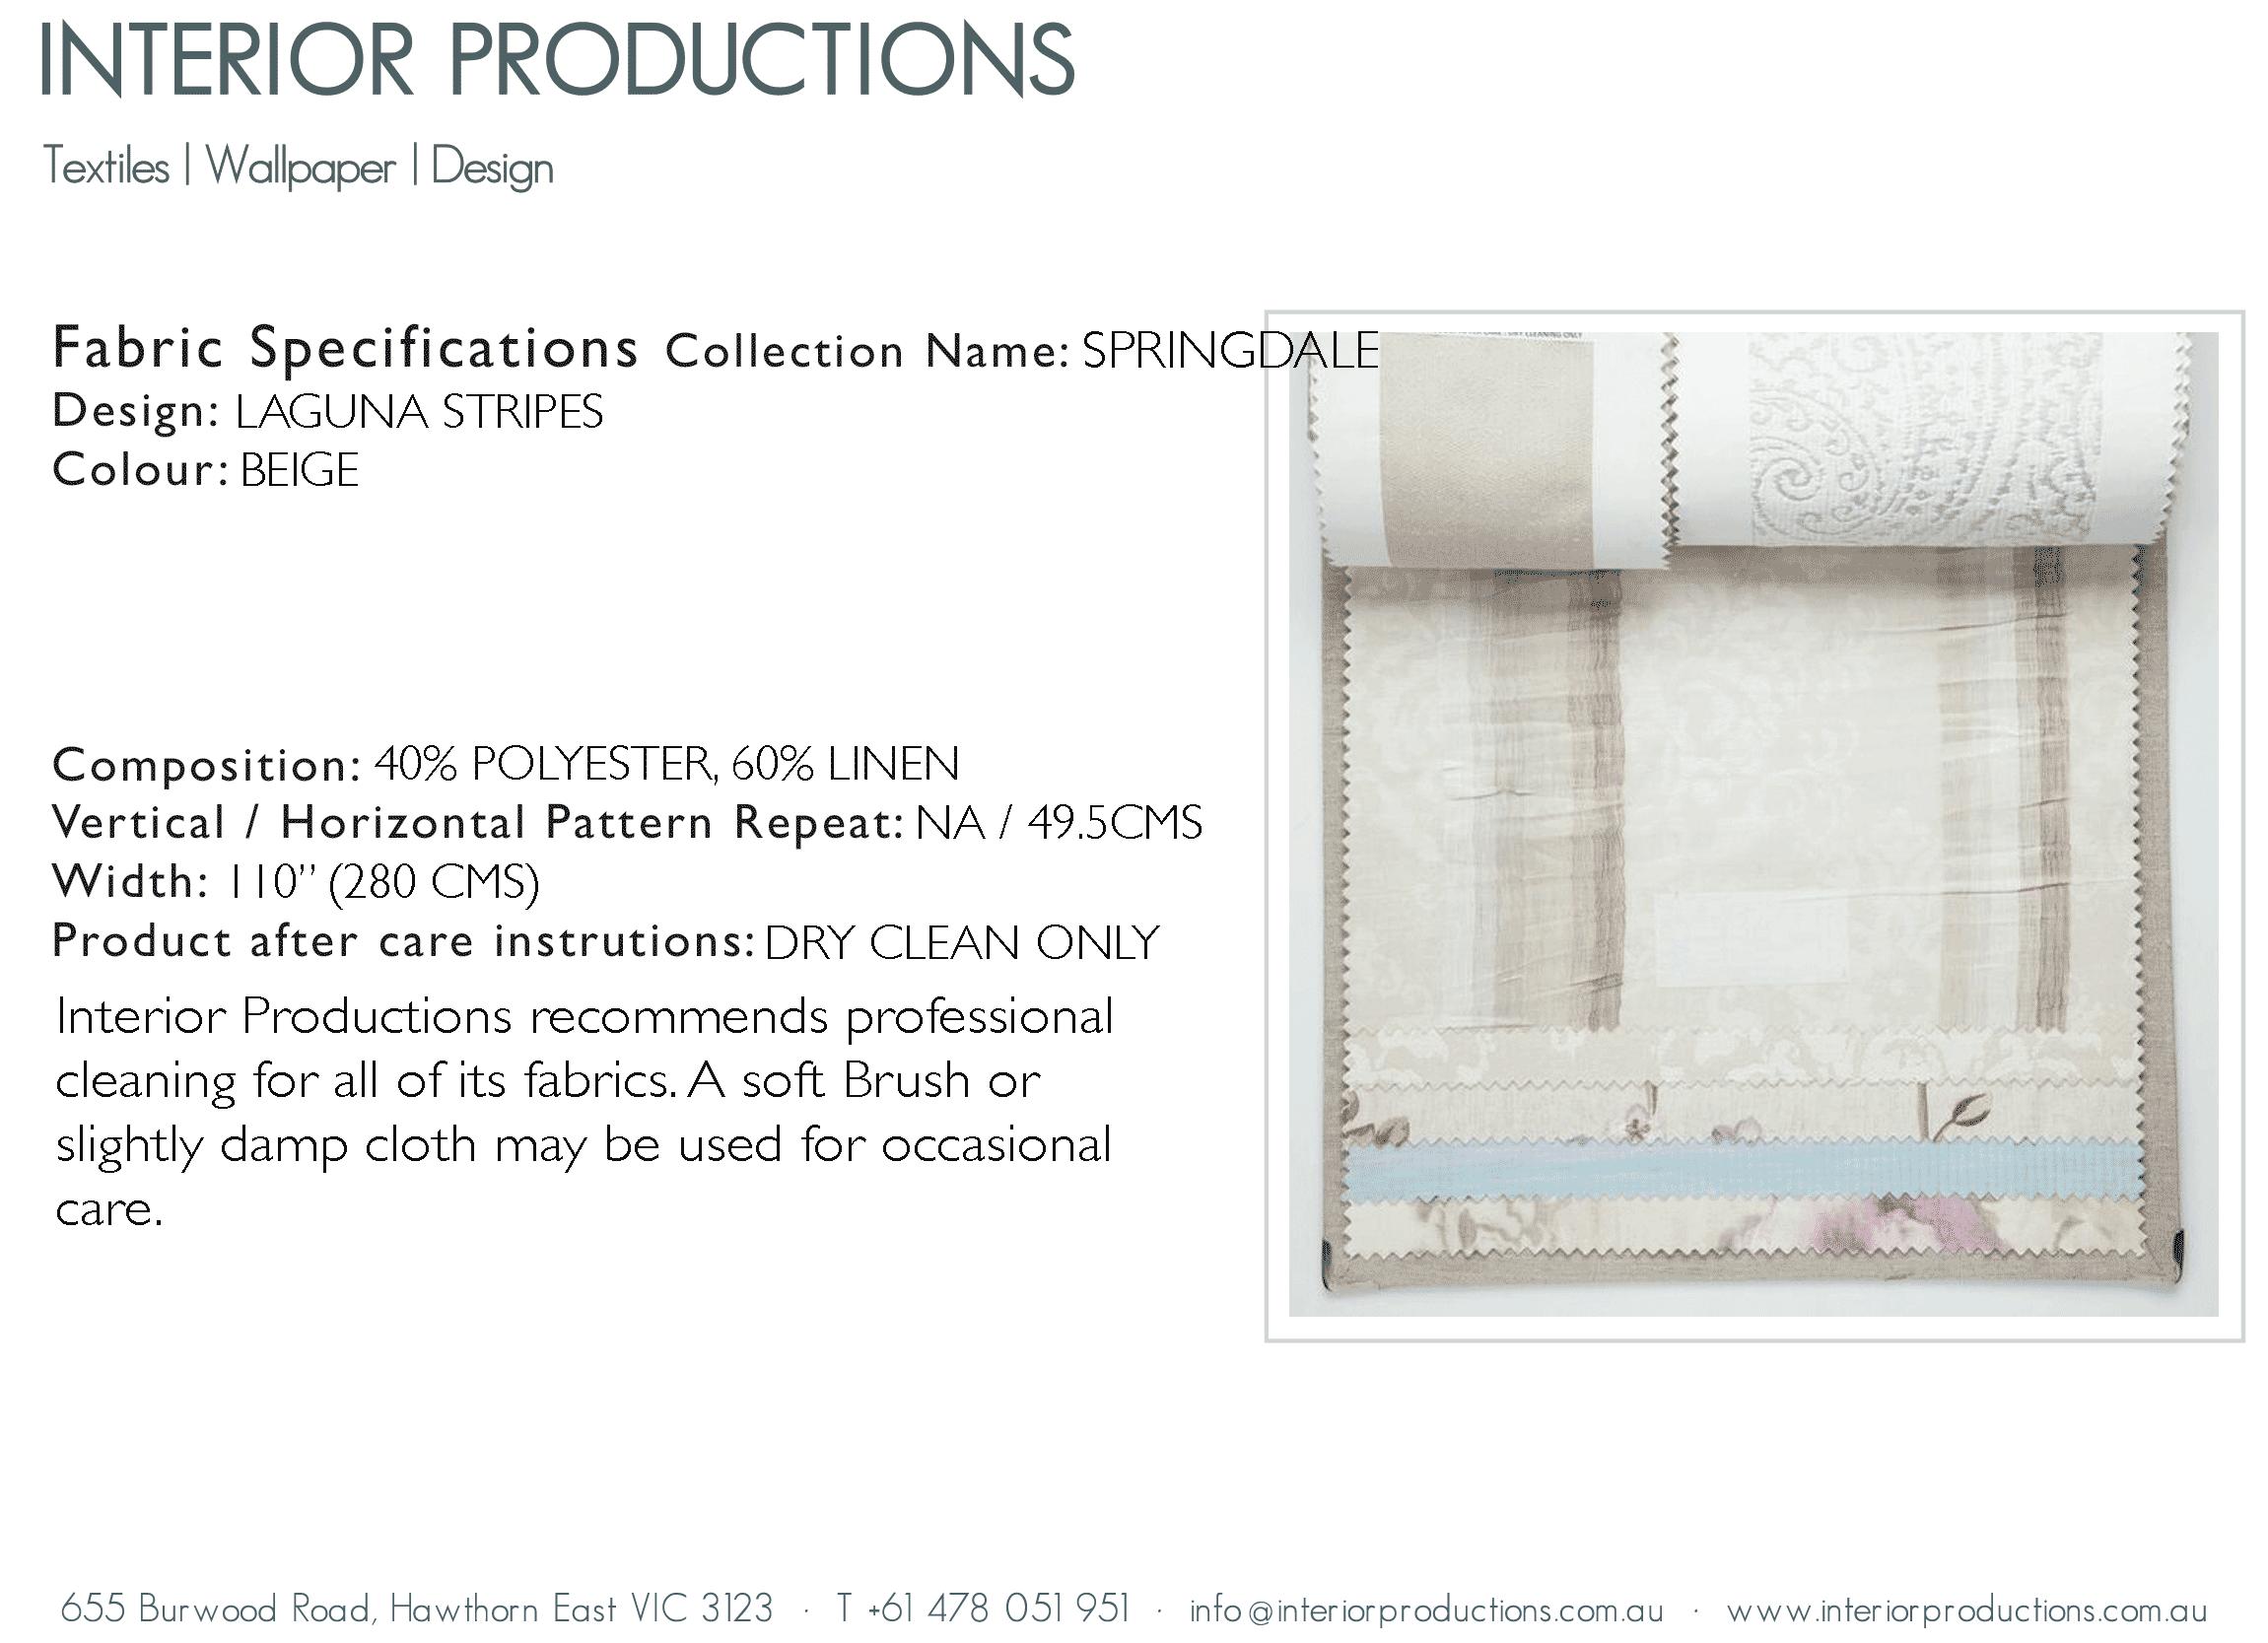 interior_productions_LAGUNA-STRIPES---BEIGE